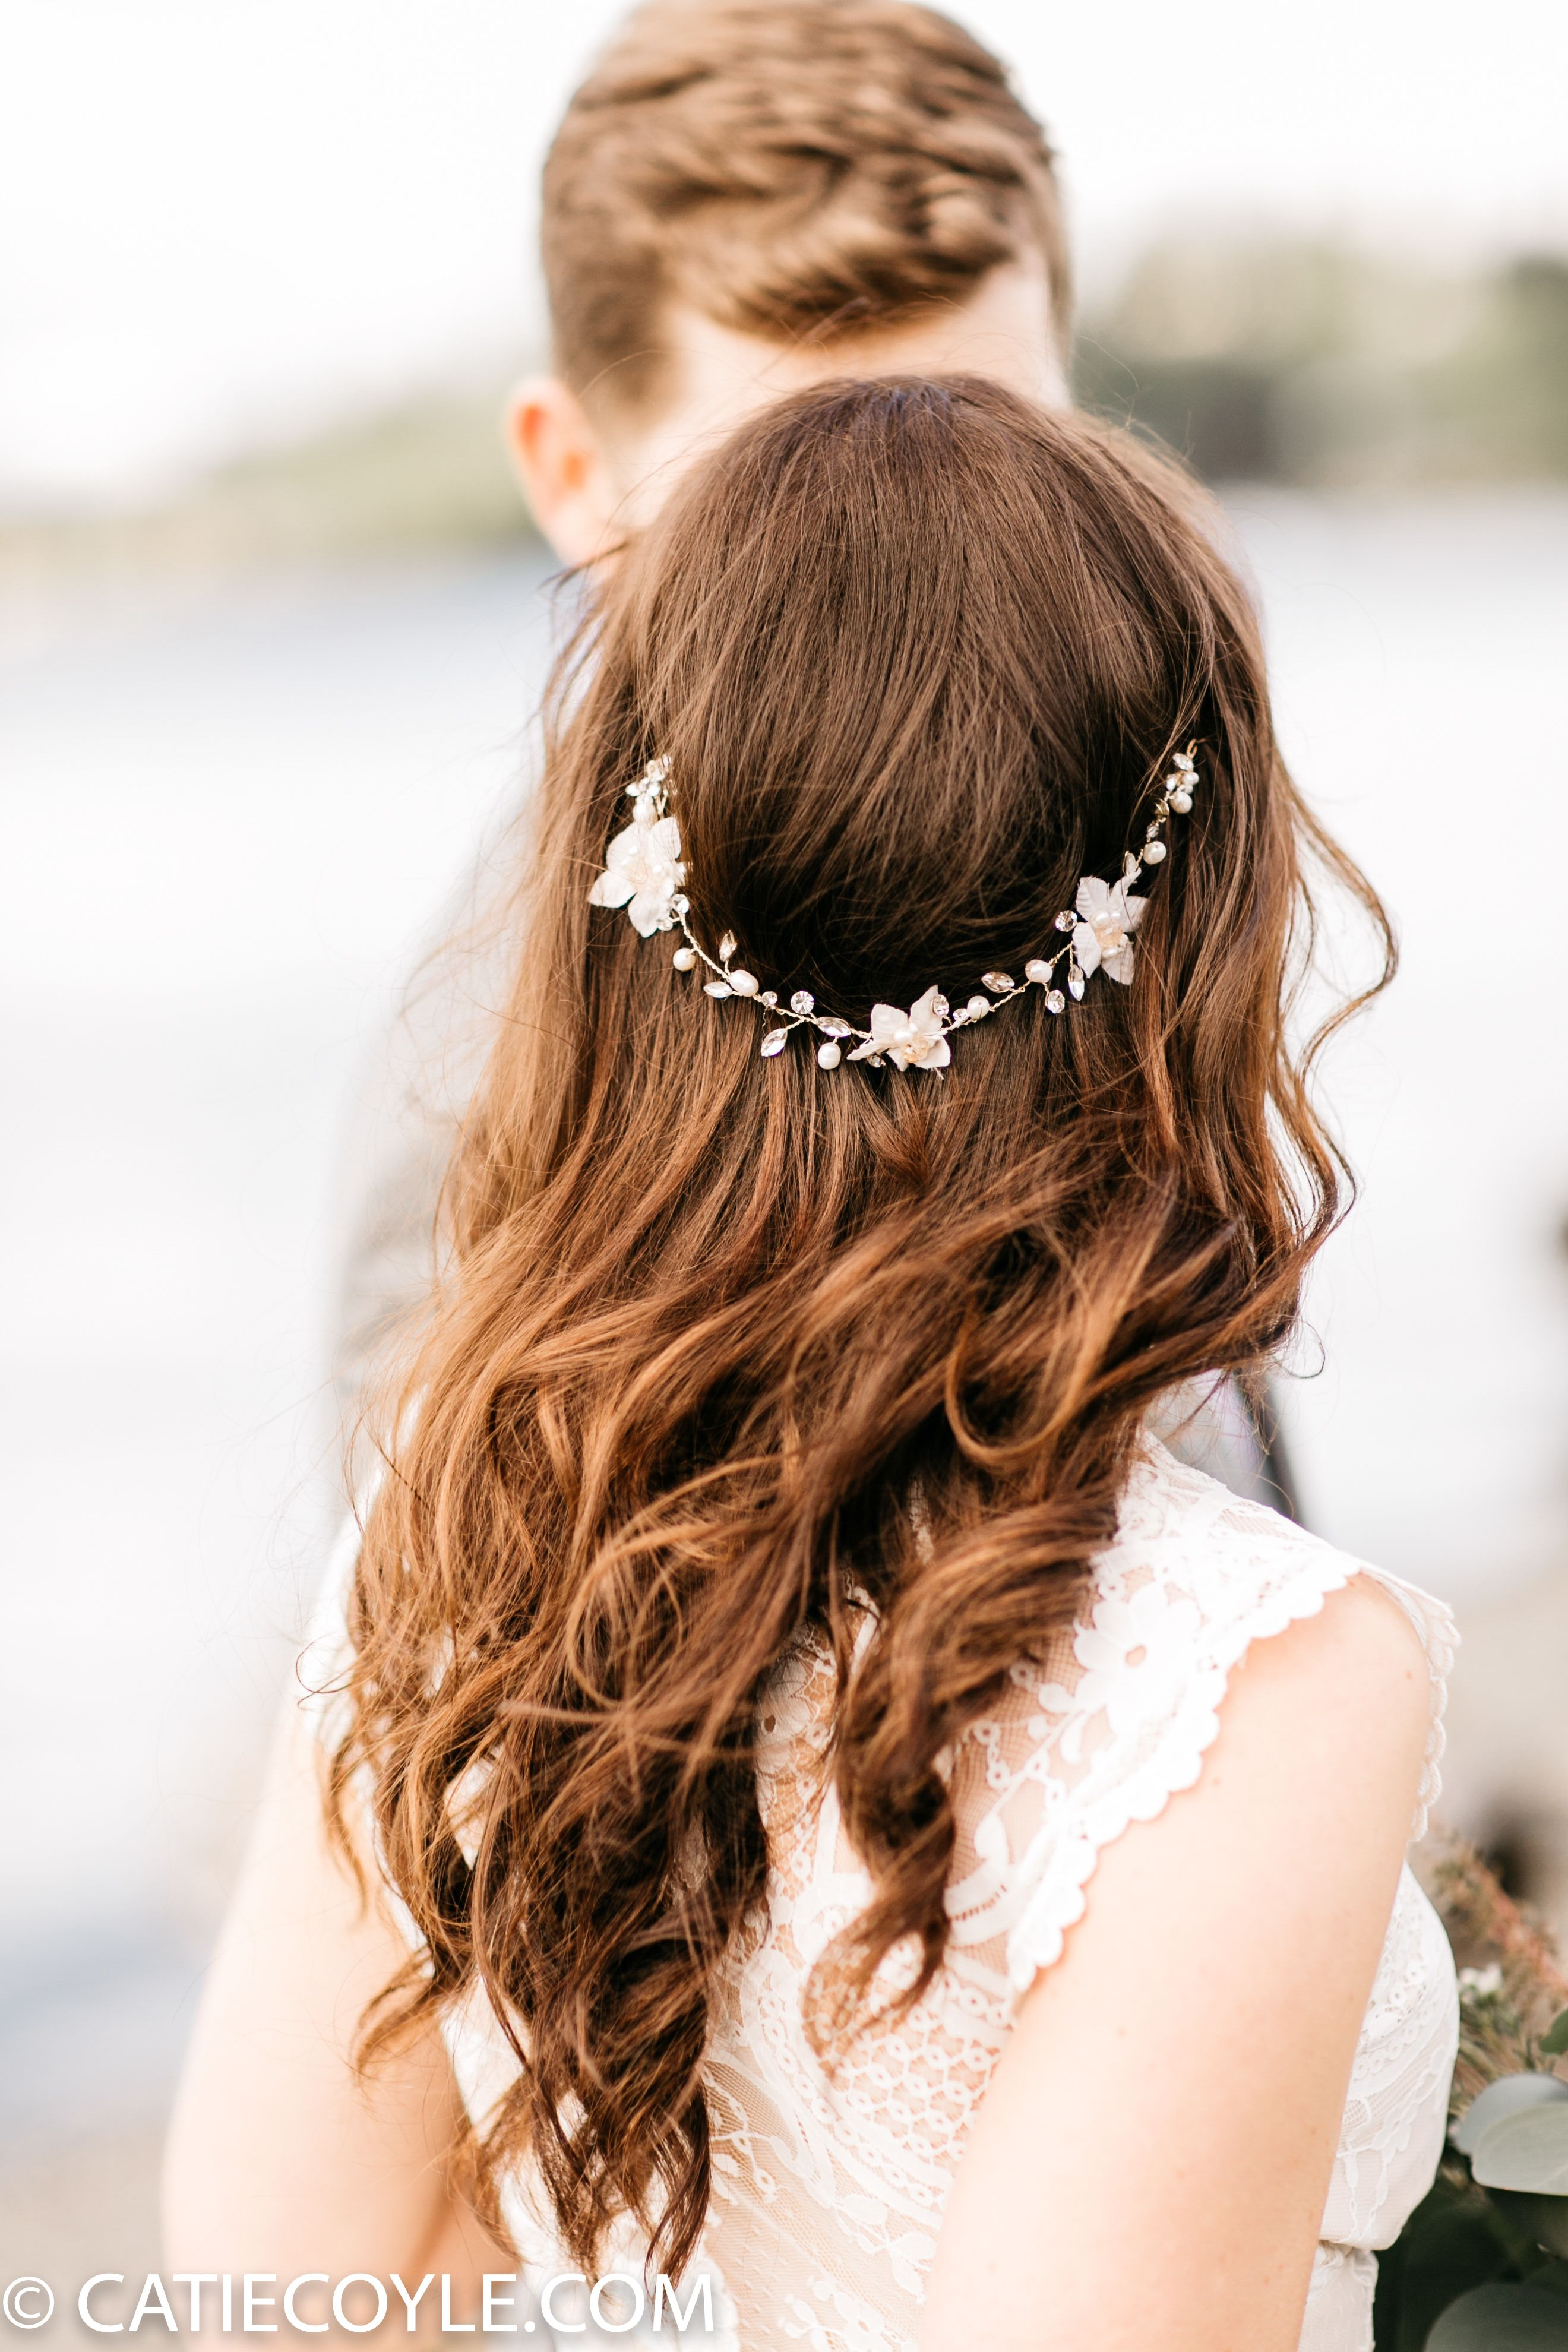 Boho Bridal Hair In 2020 Country Wedding Hairstyles Boho Bridal Hair Bridal Hair